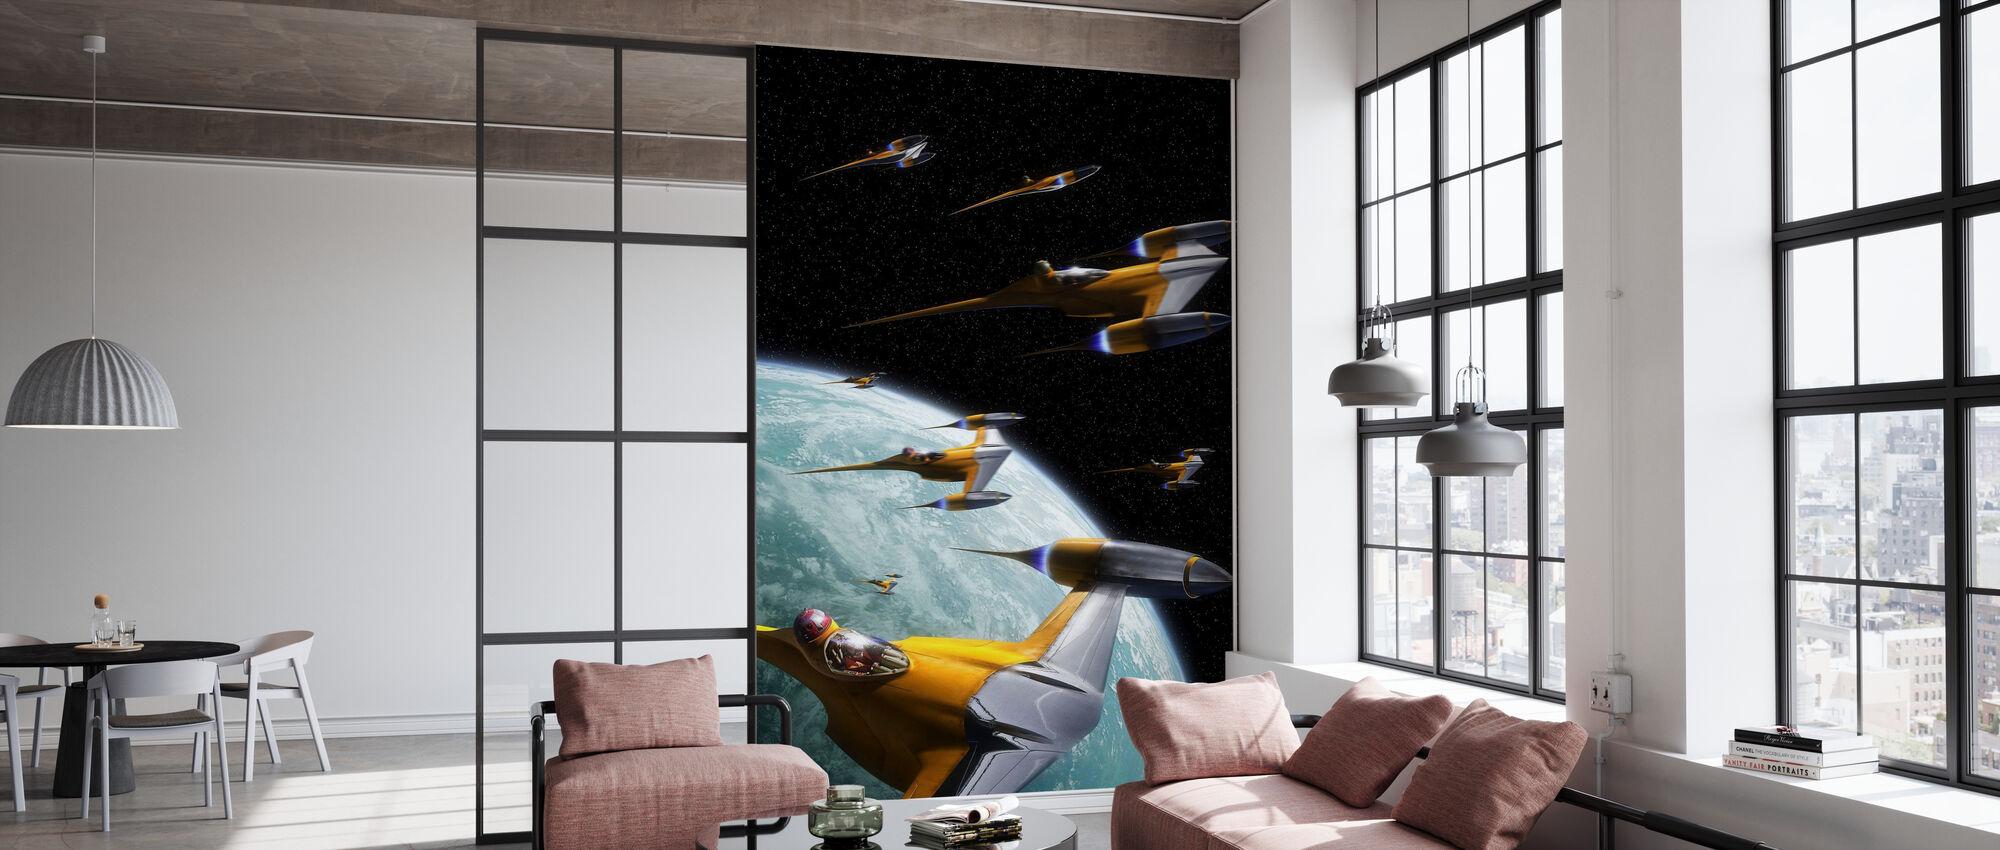 Star Wars - Naboo Starfighters 2 - Tapet - Kontor